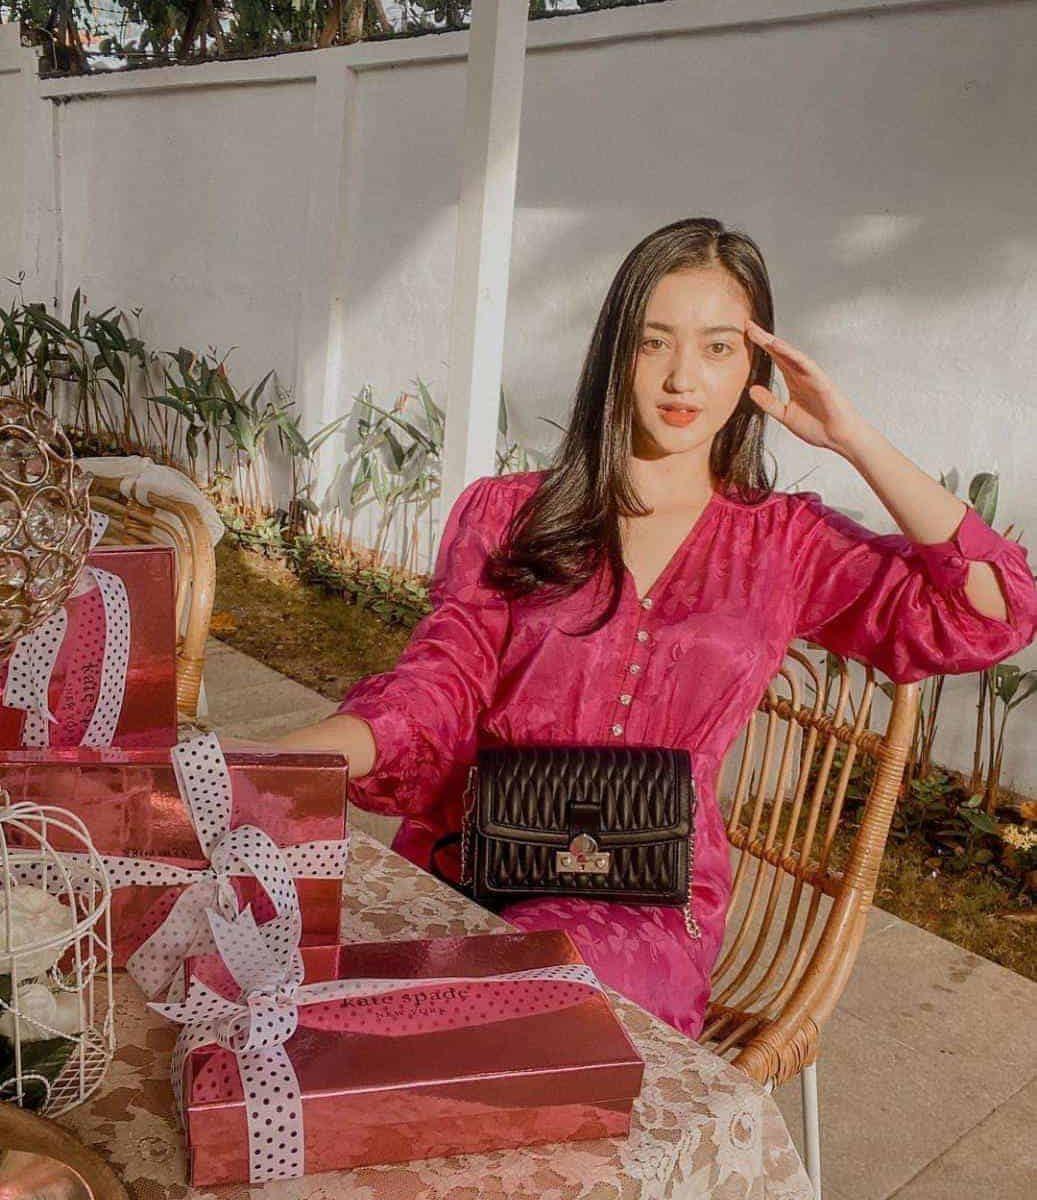 gaun pink lengan panjang gaya casual ala Ranty Maria